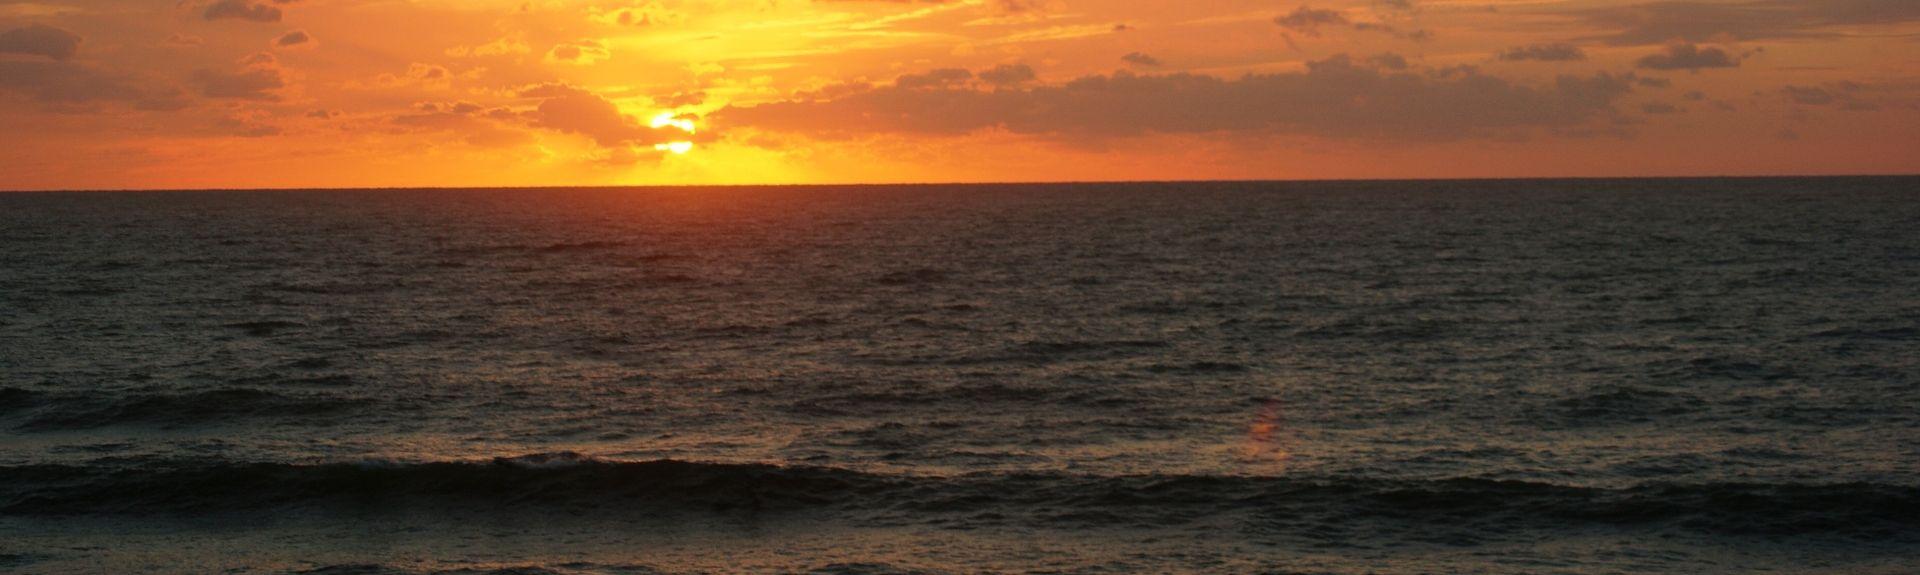 Sea Colony, Carolina Beach, NC, USA